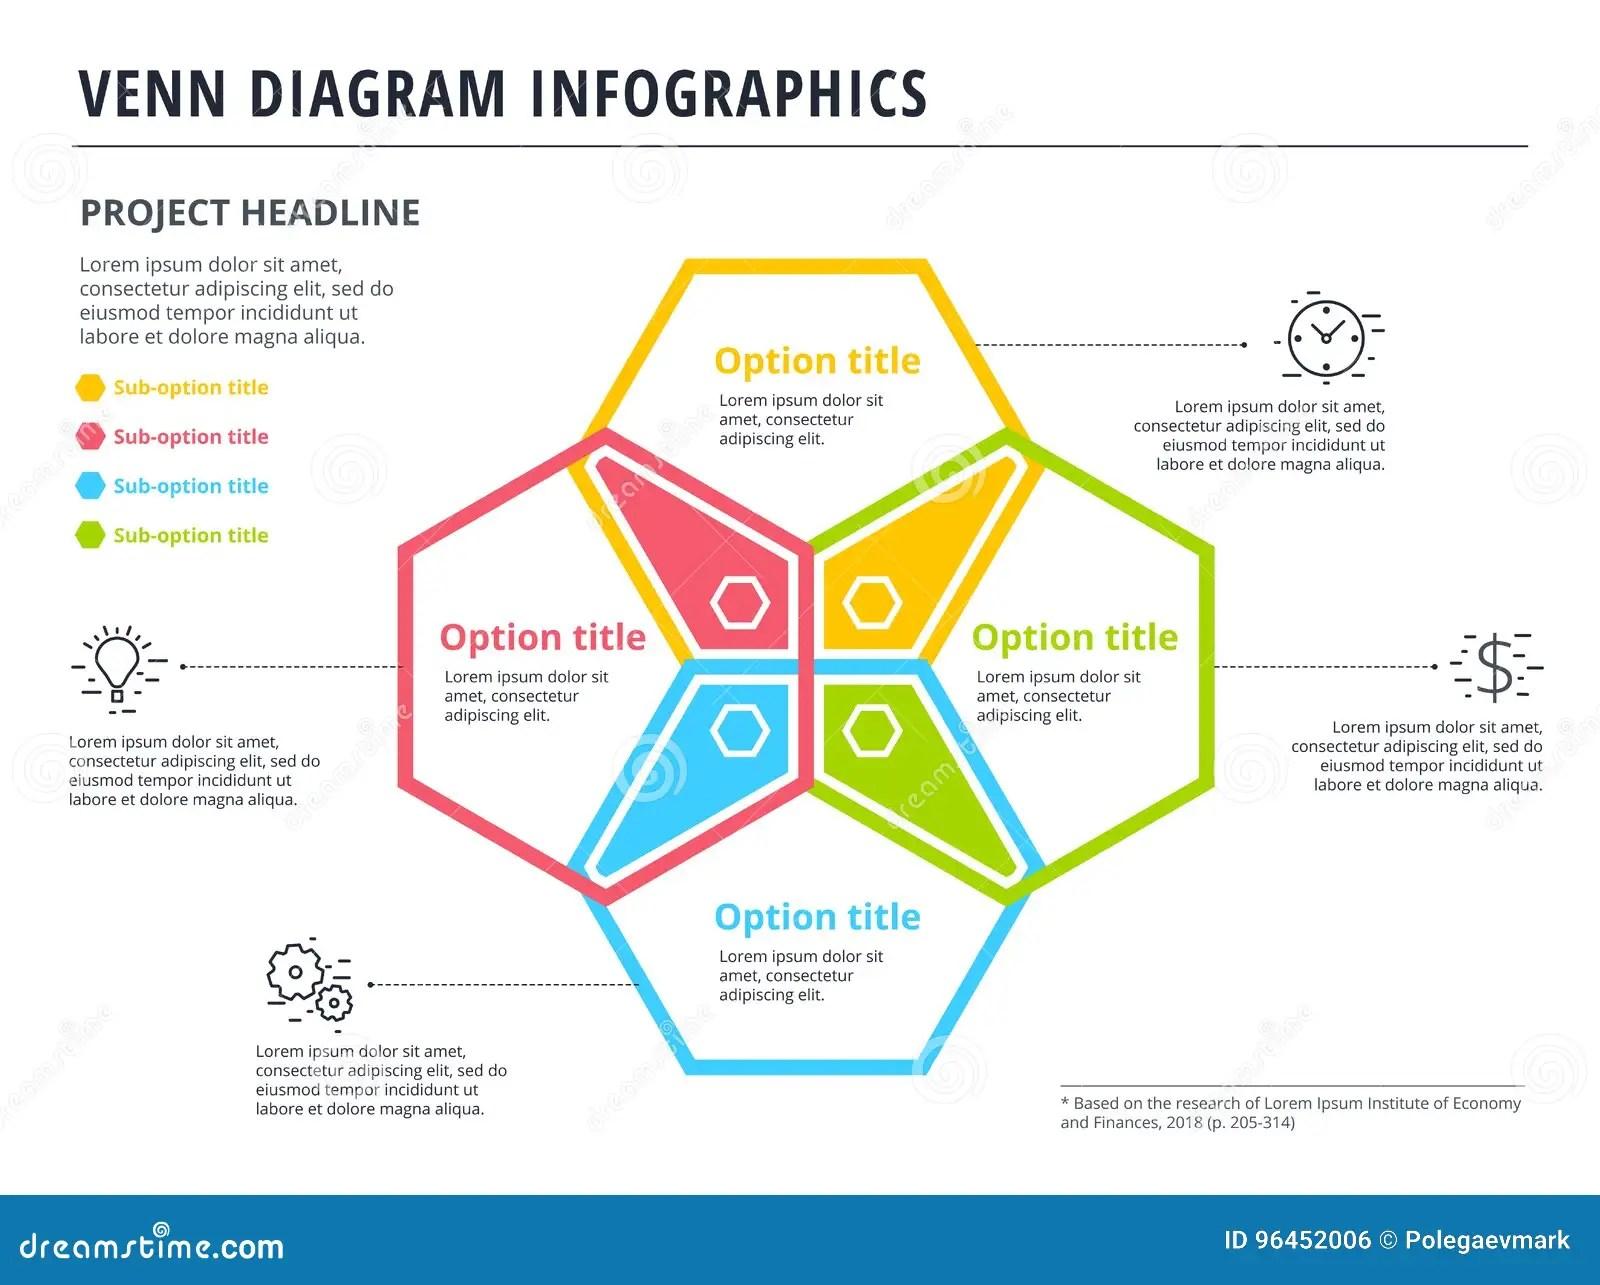 Venn Diagramm Mit 4 Kreise Infographics Schablonendesign